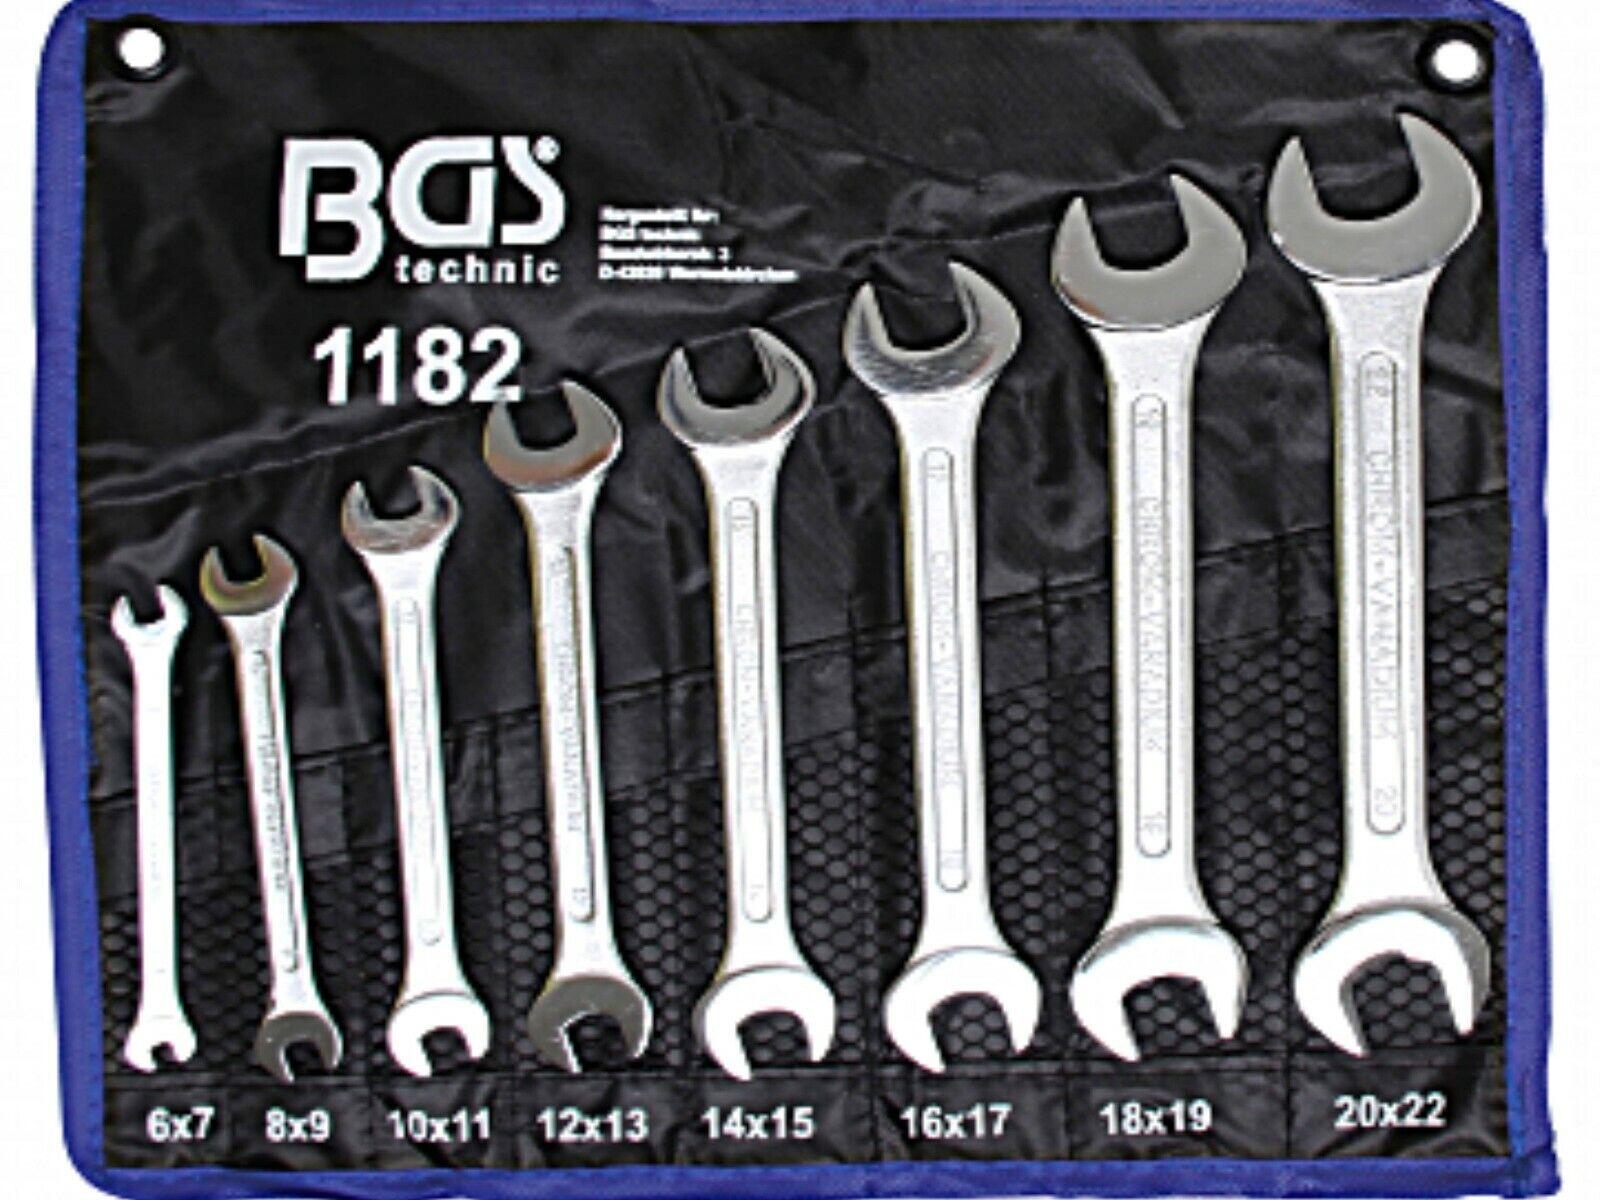 BGS 8-tlg Satz Doppel Maulschlüssel DIN3110 Doppelmaulschlüssel Gabelschlüssel